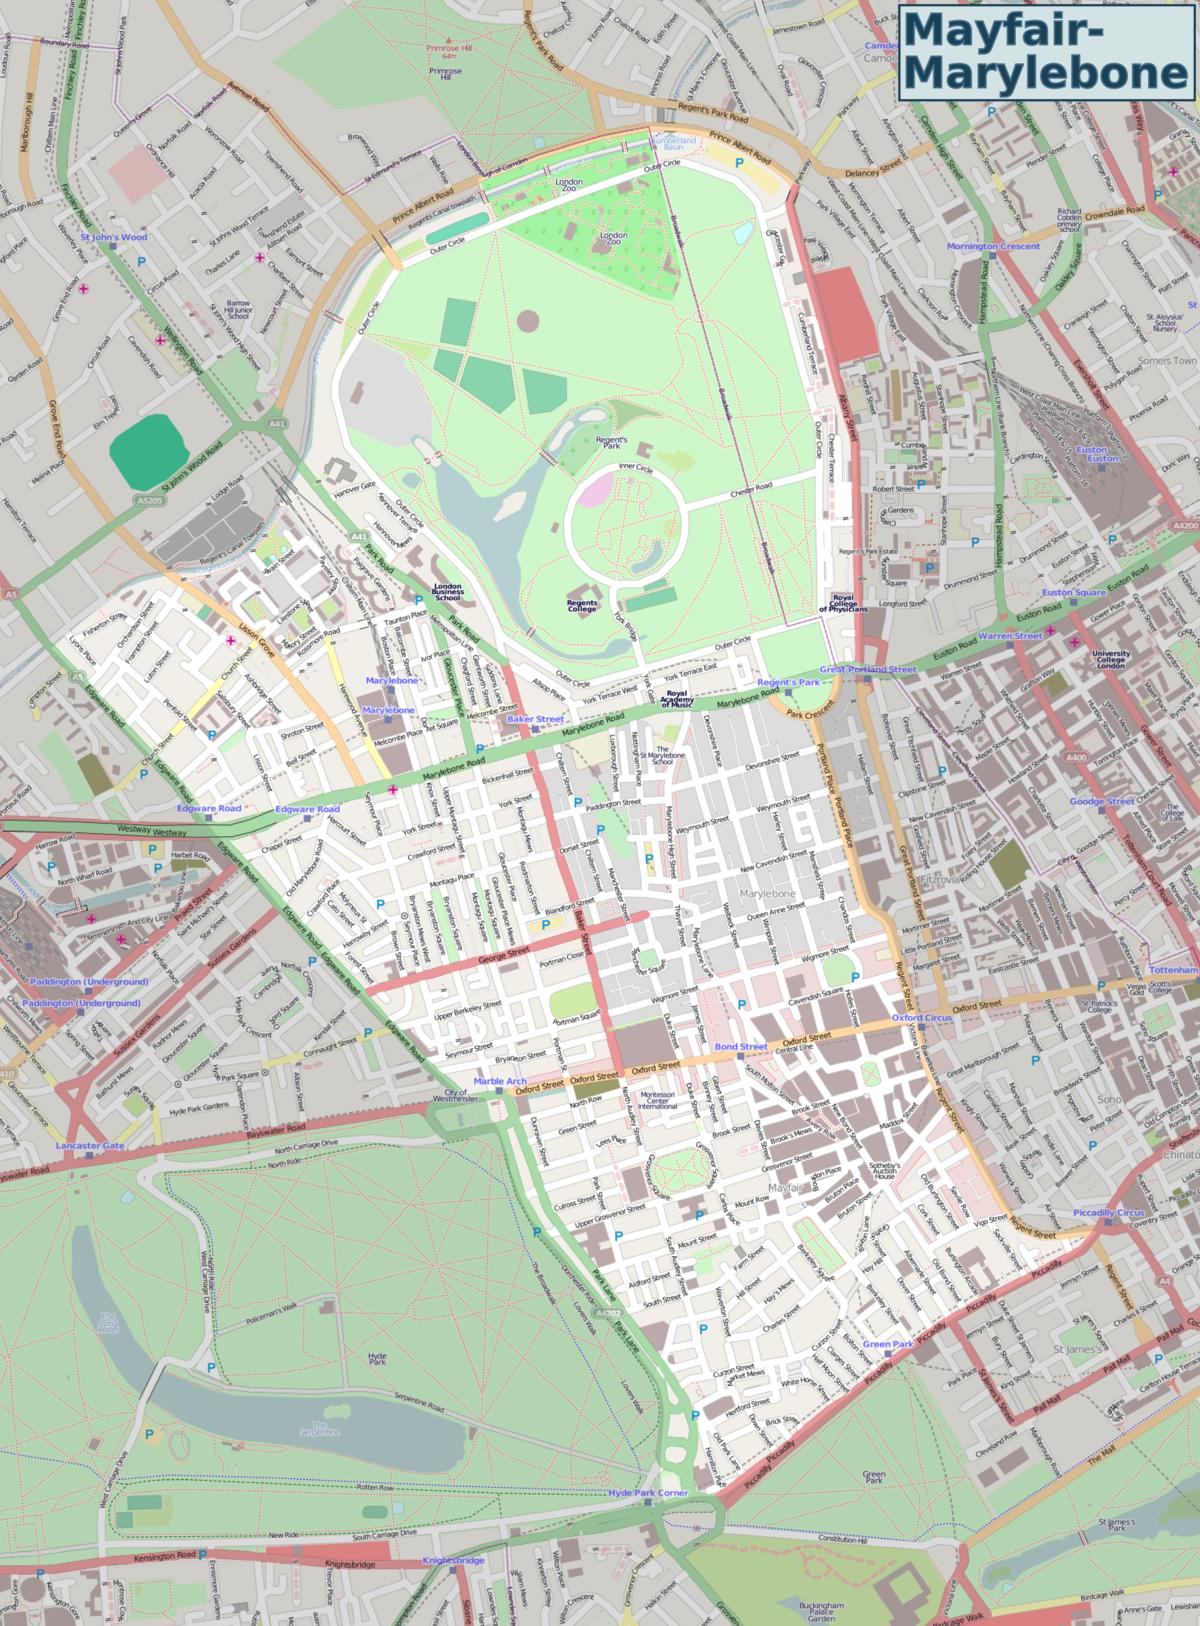 1200px-Mayfair-Marylebone_OSM_map Map Baker Street on mt. baker map, baker ca map, king's cross map, baker fire map, baker oregon map, somerset road map, london map, baker la zip code map, baker mine map, baker library, baker lake map, baker hill map, baker trail map, baker river map, baker school map, baker county road map, kings cross st pancras map, baker house, baker st london, baker park map,